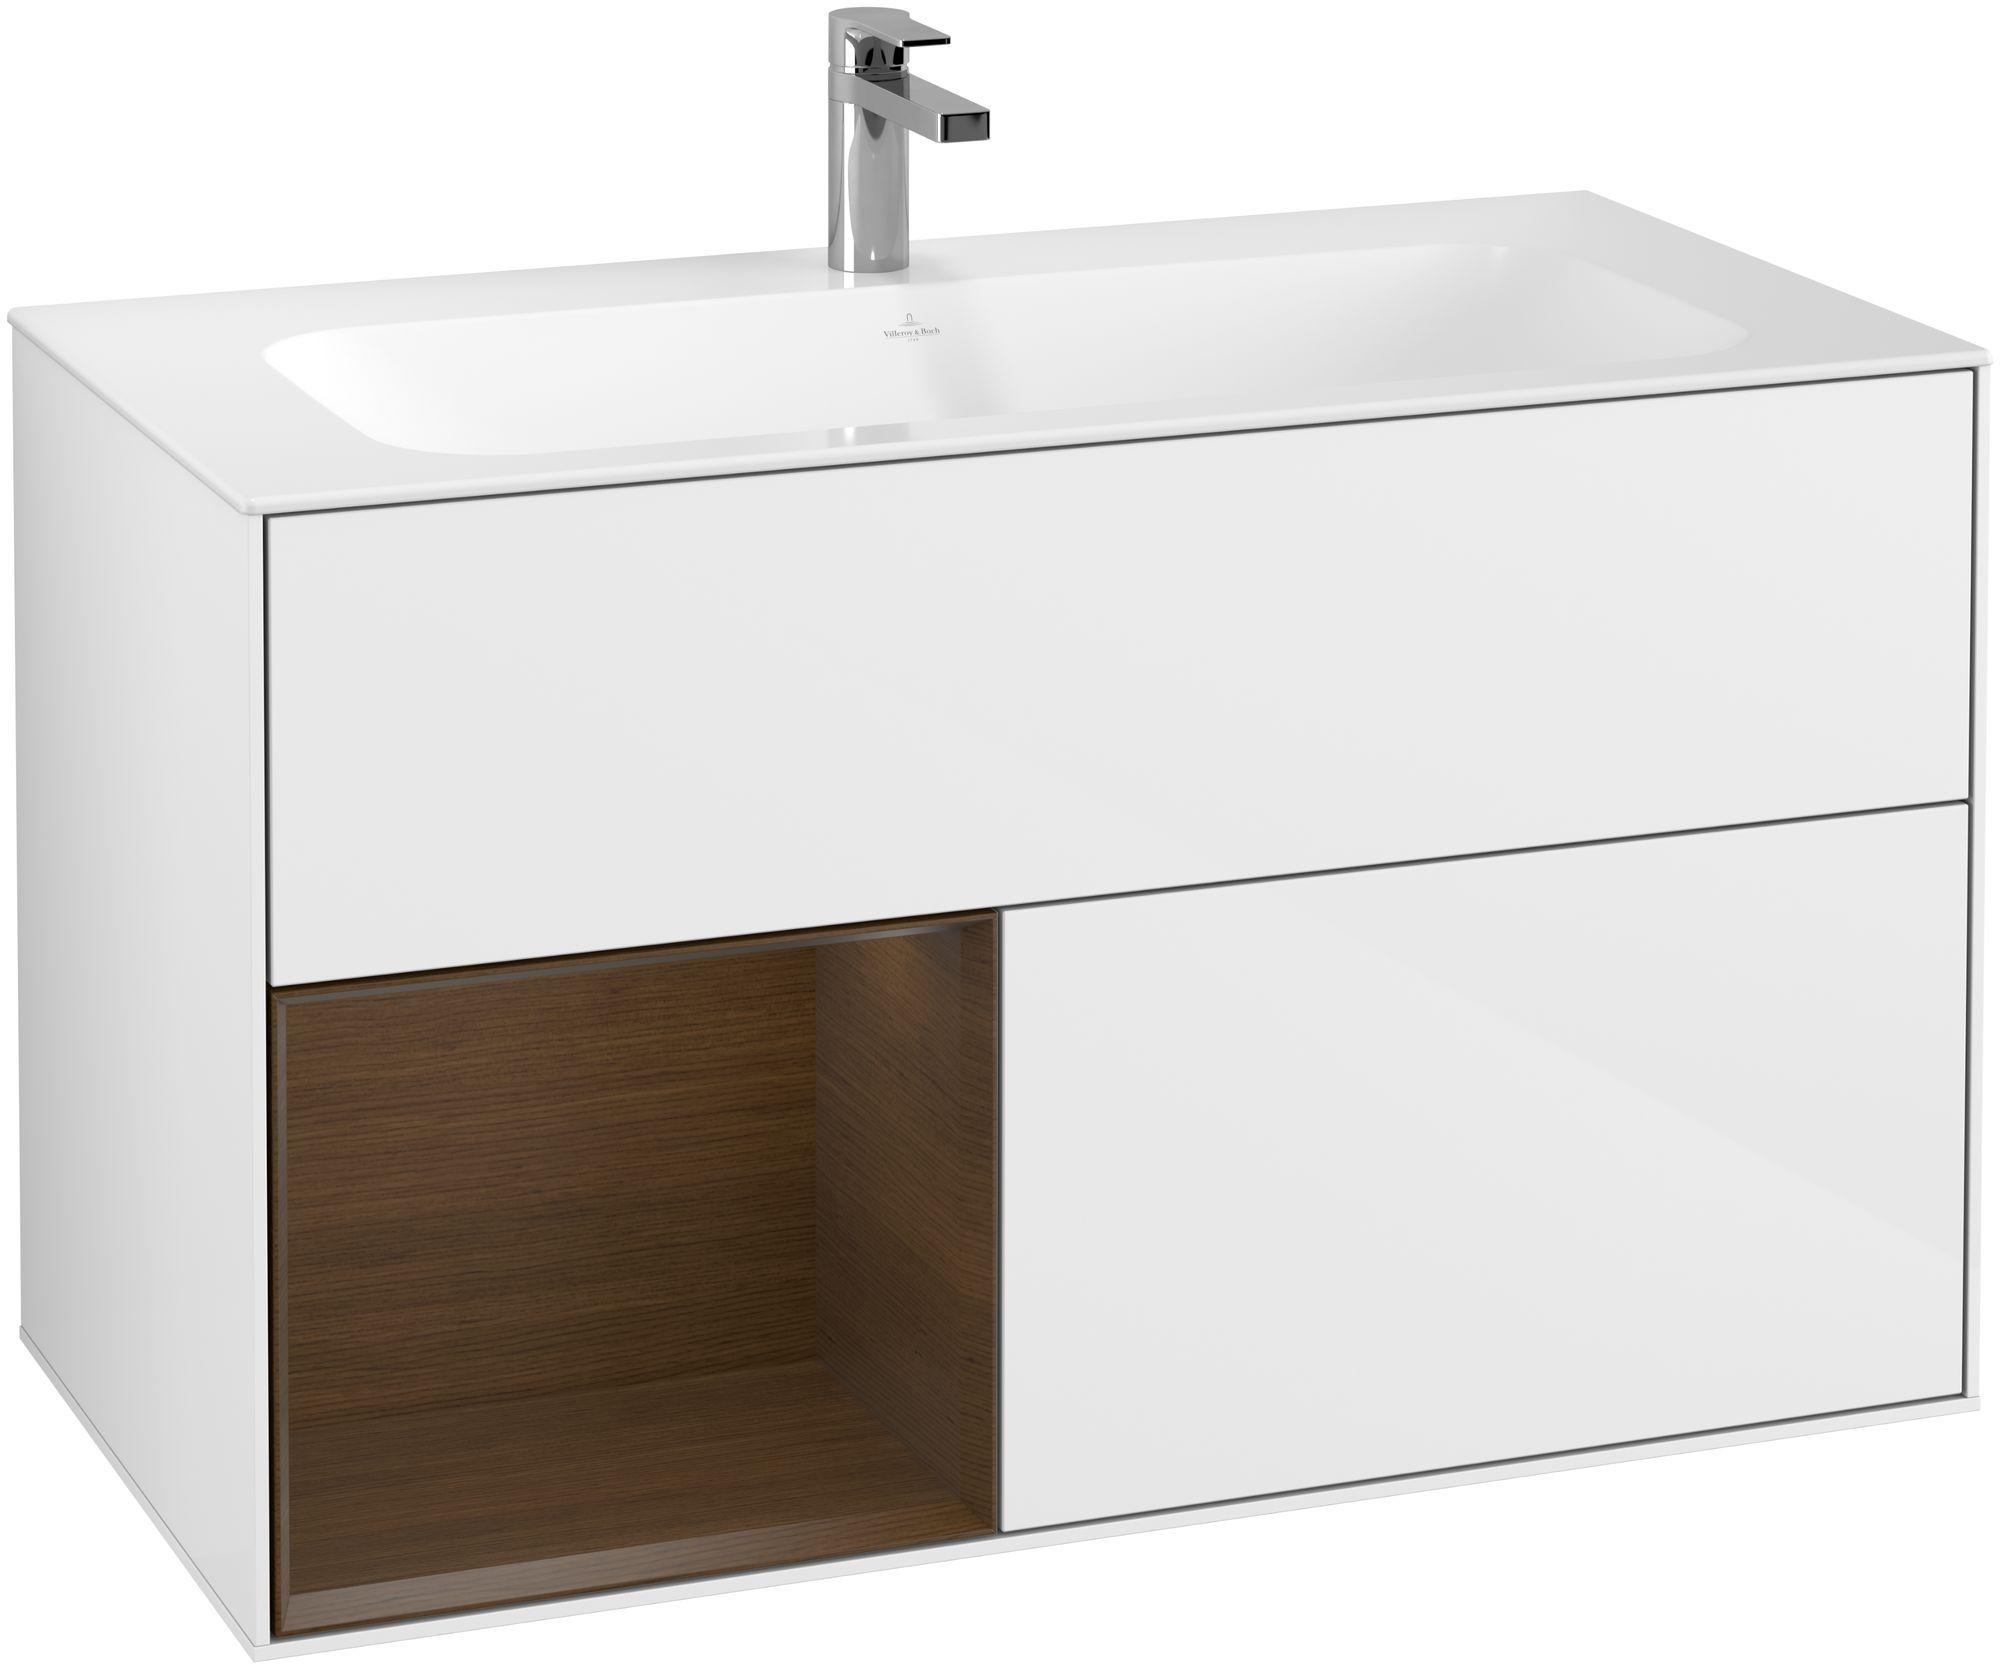 Villeroy & Boch Finion F03 Waschtischunterschrank mit Regalelement 2 Auszüge LED-Beleuchtung B:99,6xH:59,1xT:49,8cm Front, Korpus: Glossy White Lack, Regal: Walnut Veneer F030GNGF